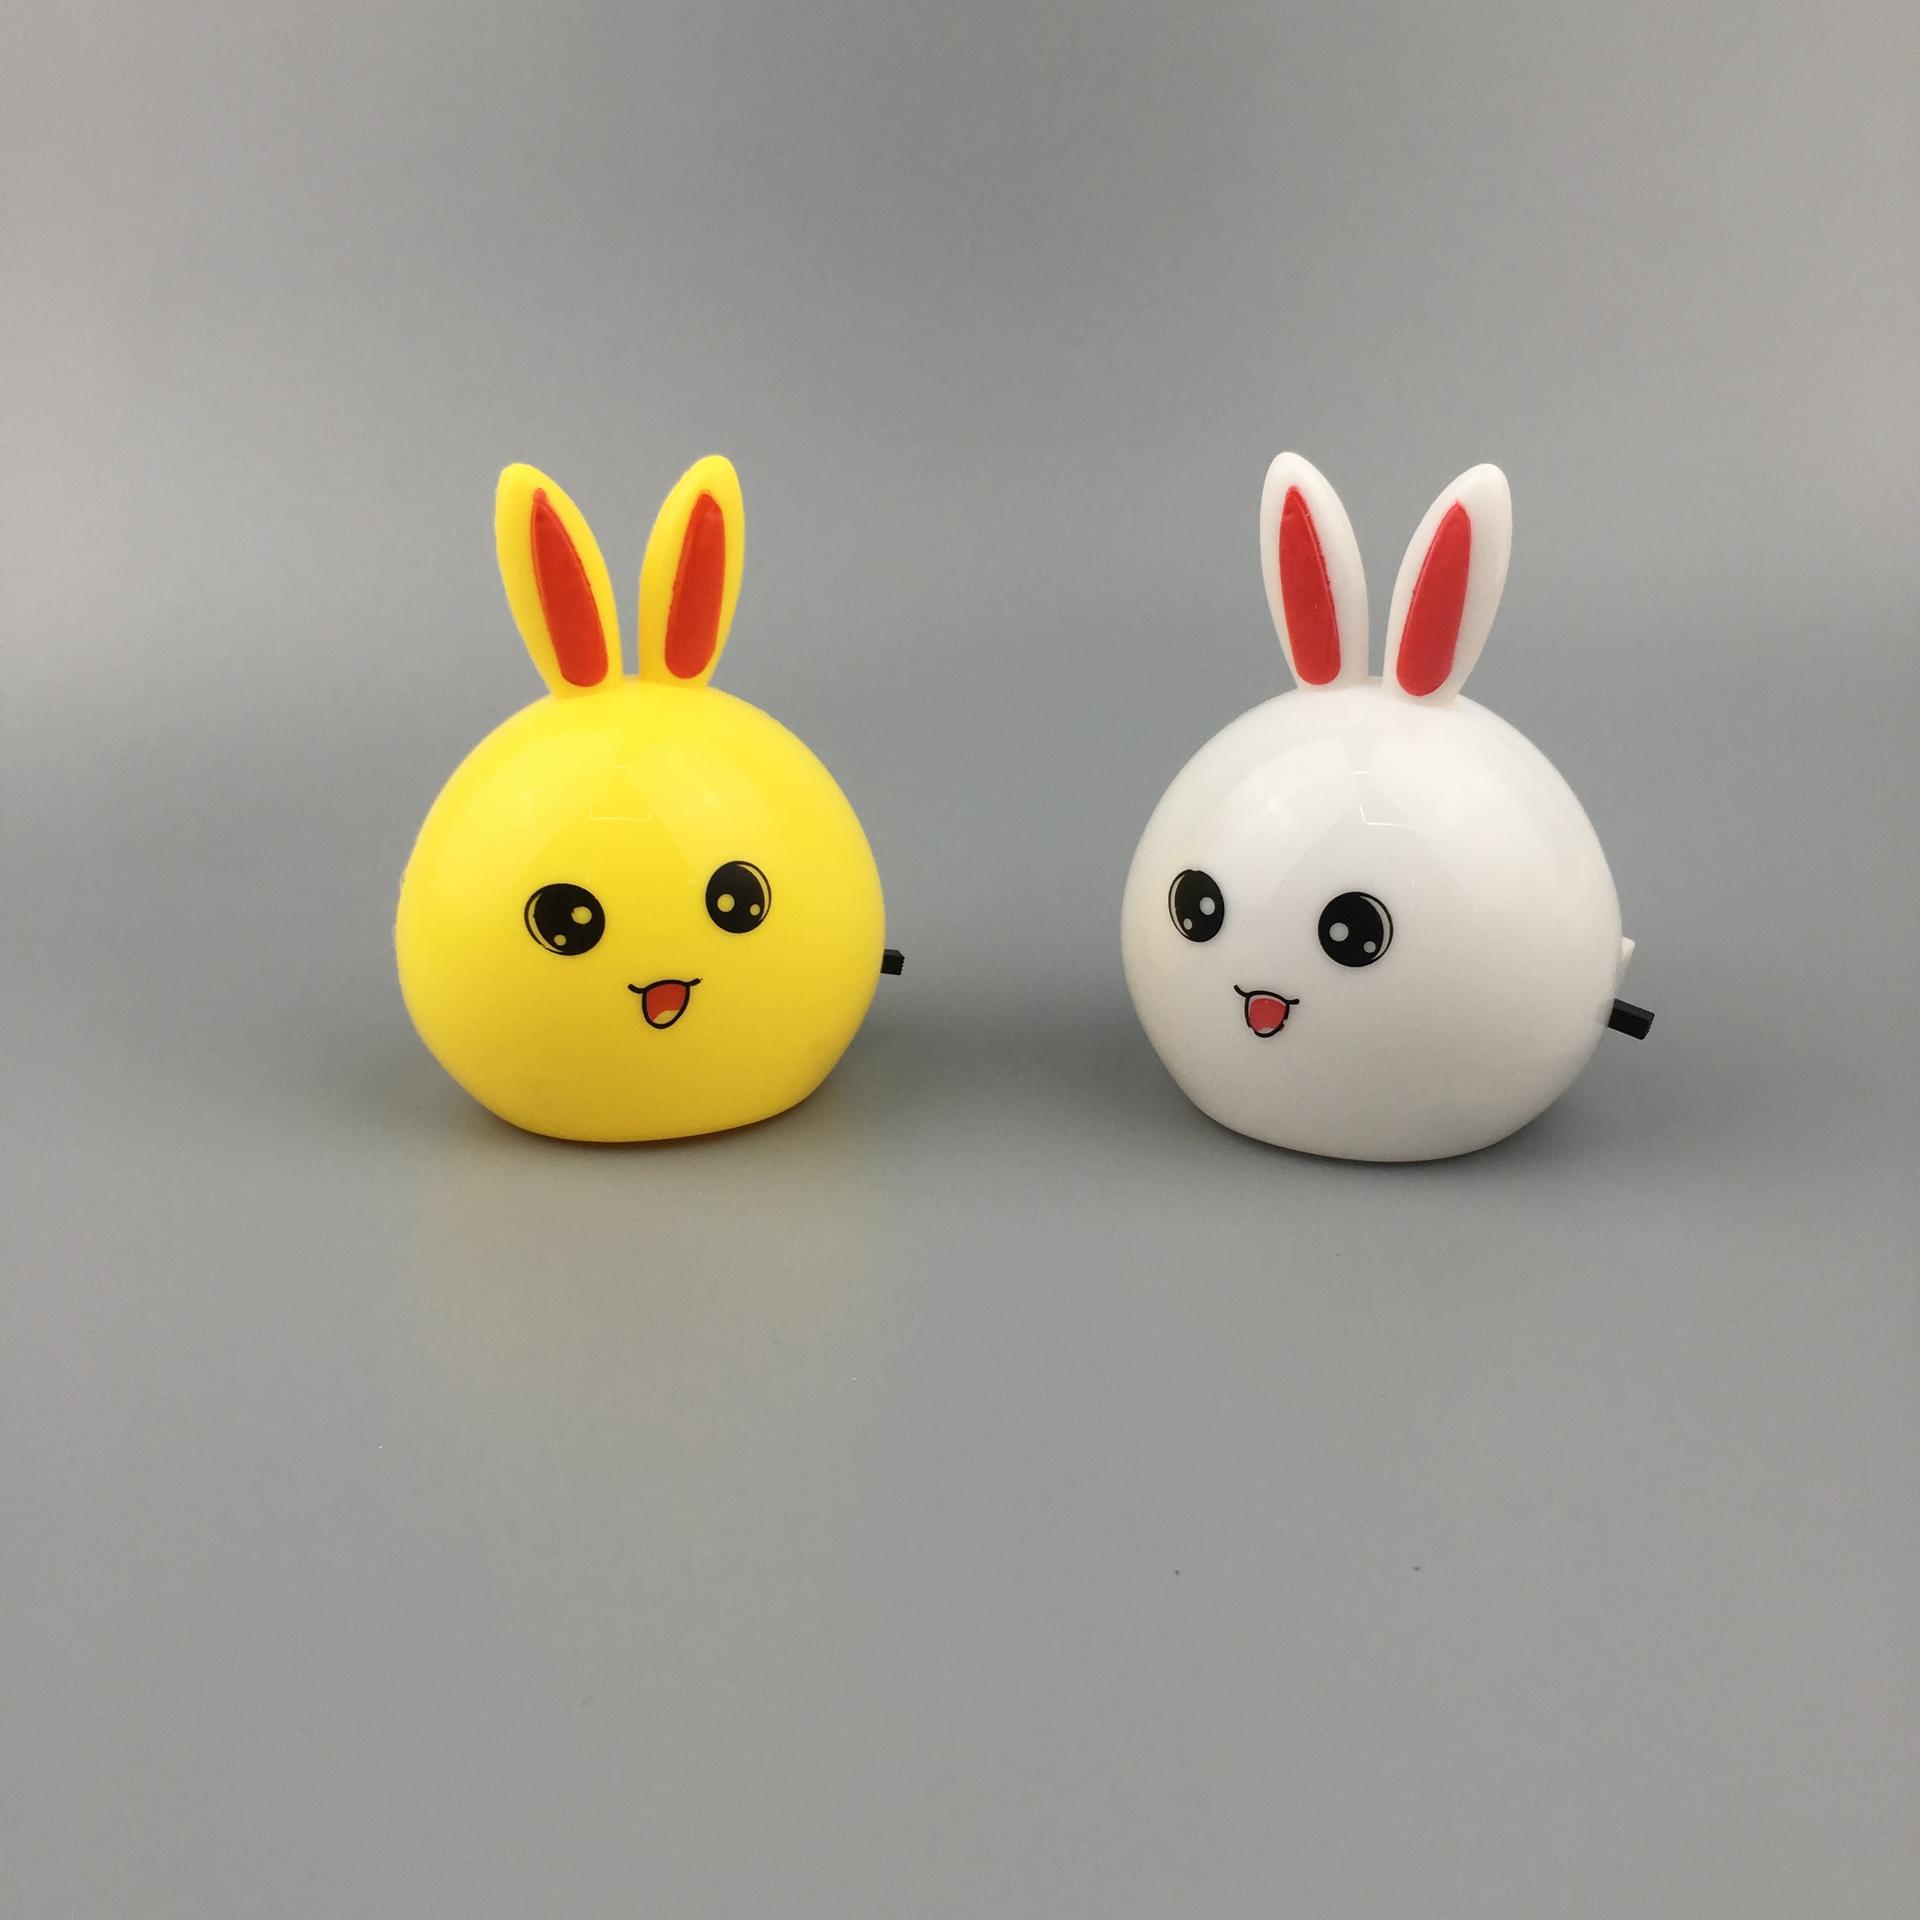 W103 Oval long-eared rabbit shape 4SMD mini switch plug in night light with 0.6W AC 110V 220V